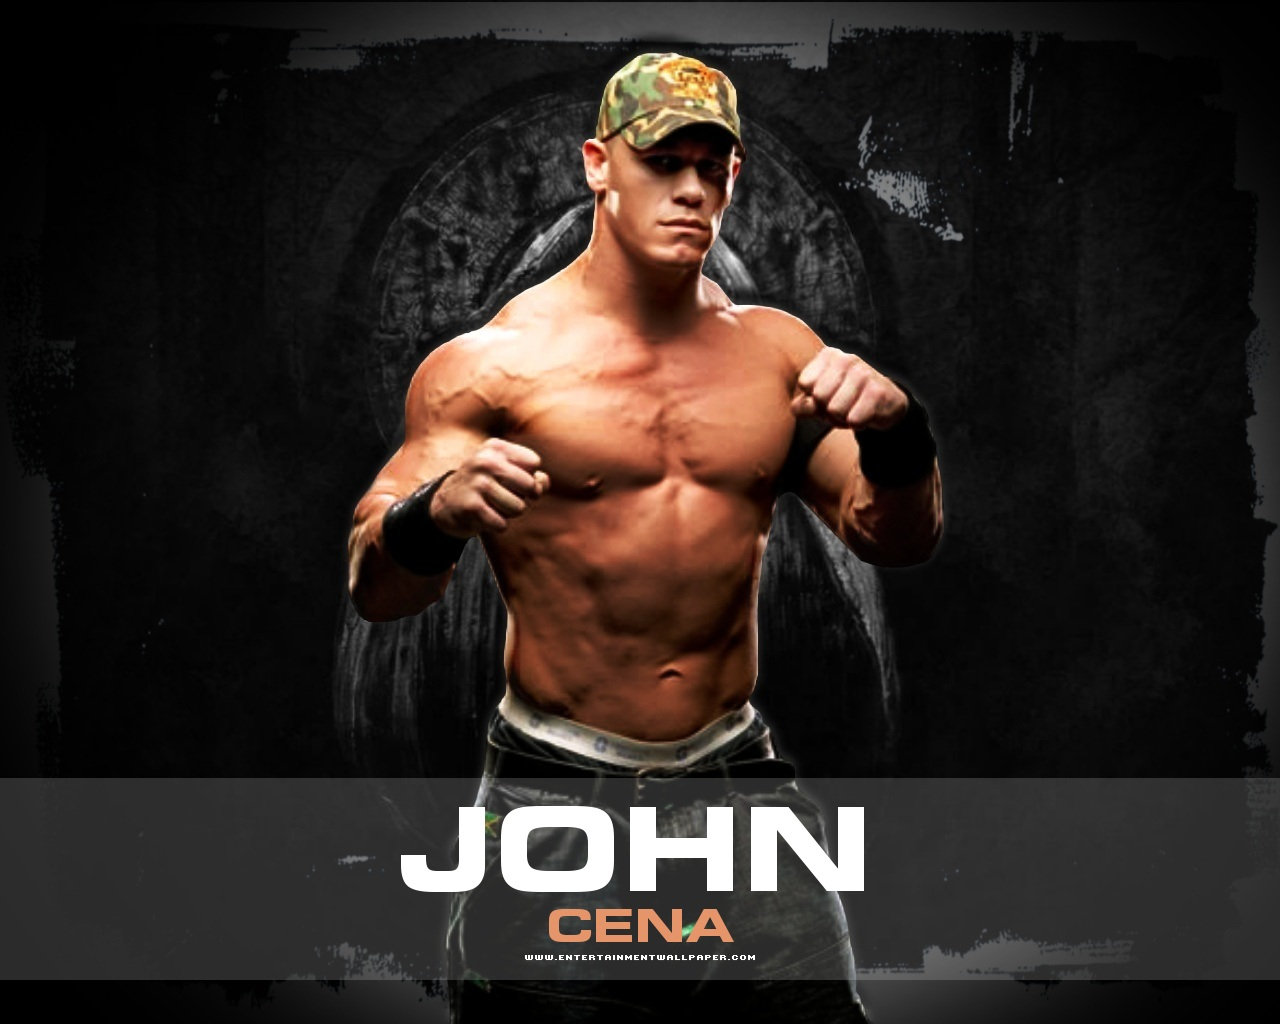 WWE Wallpapers: WWE Superstar John Cena